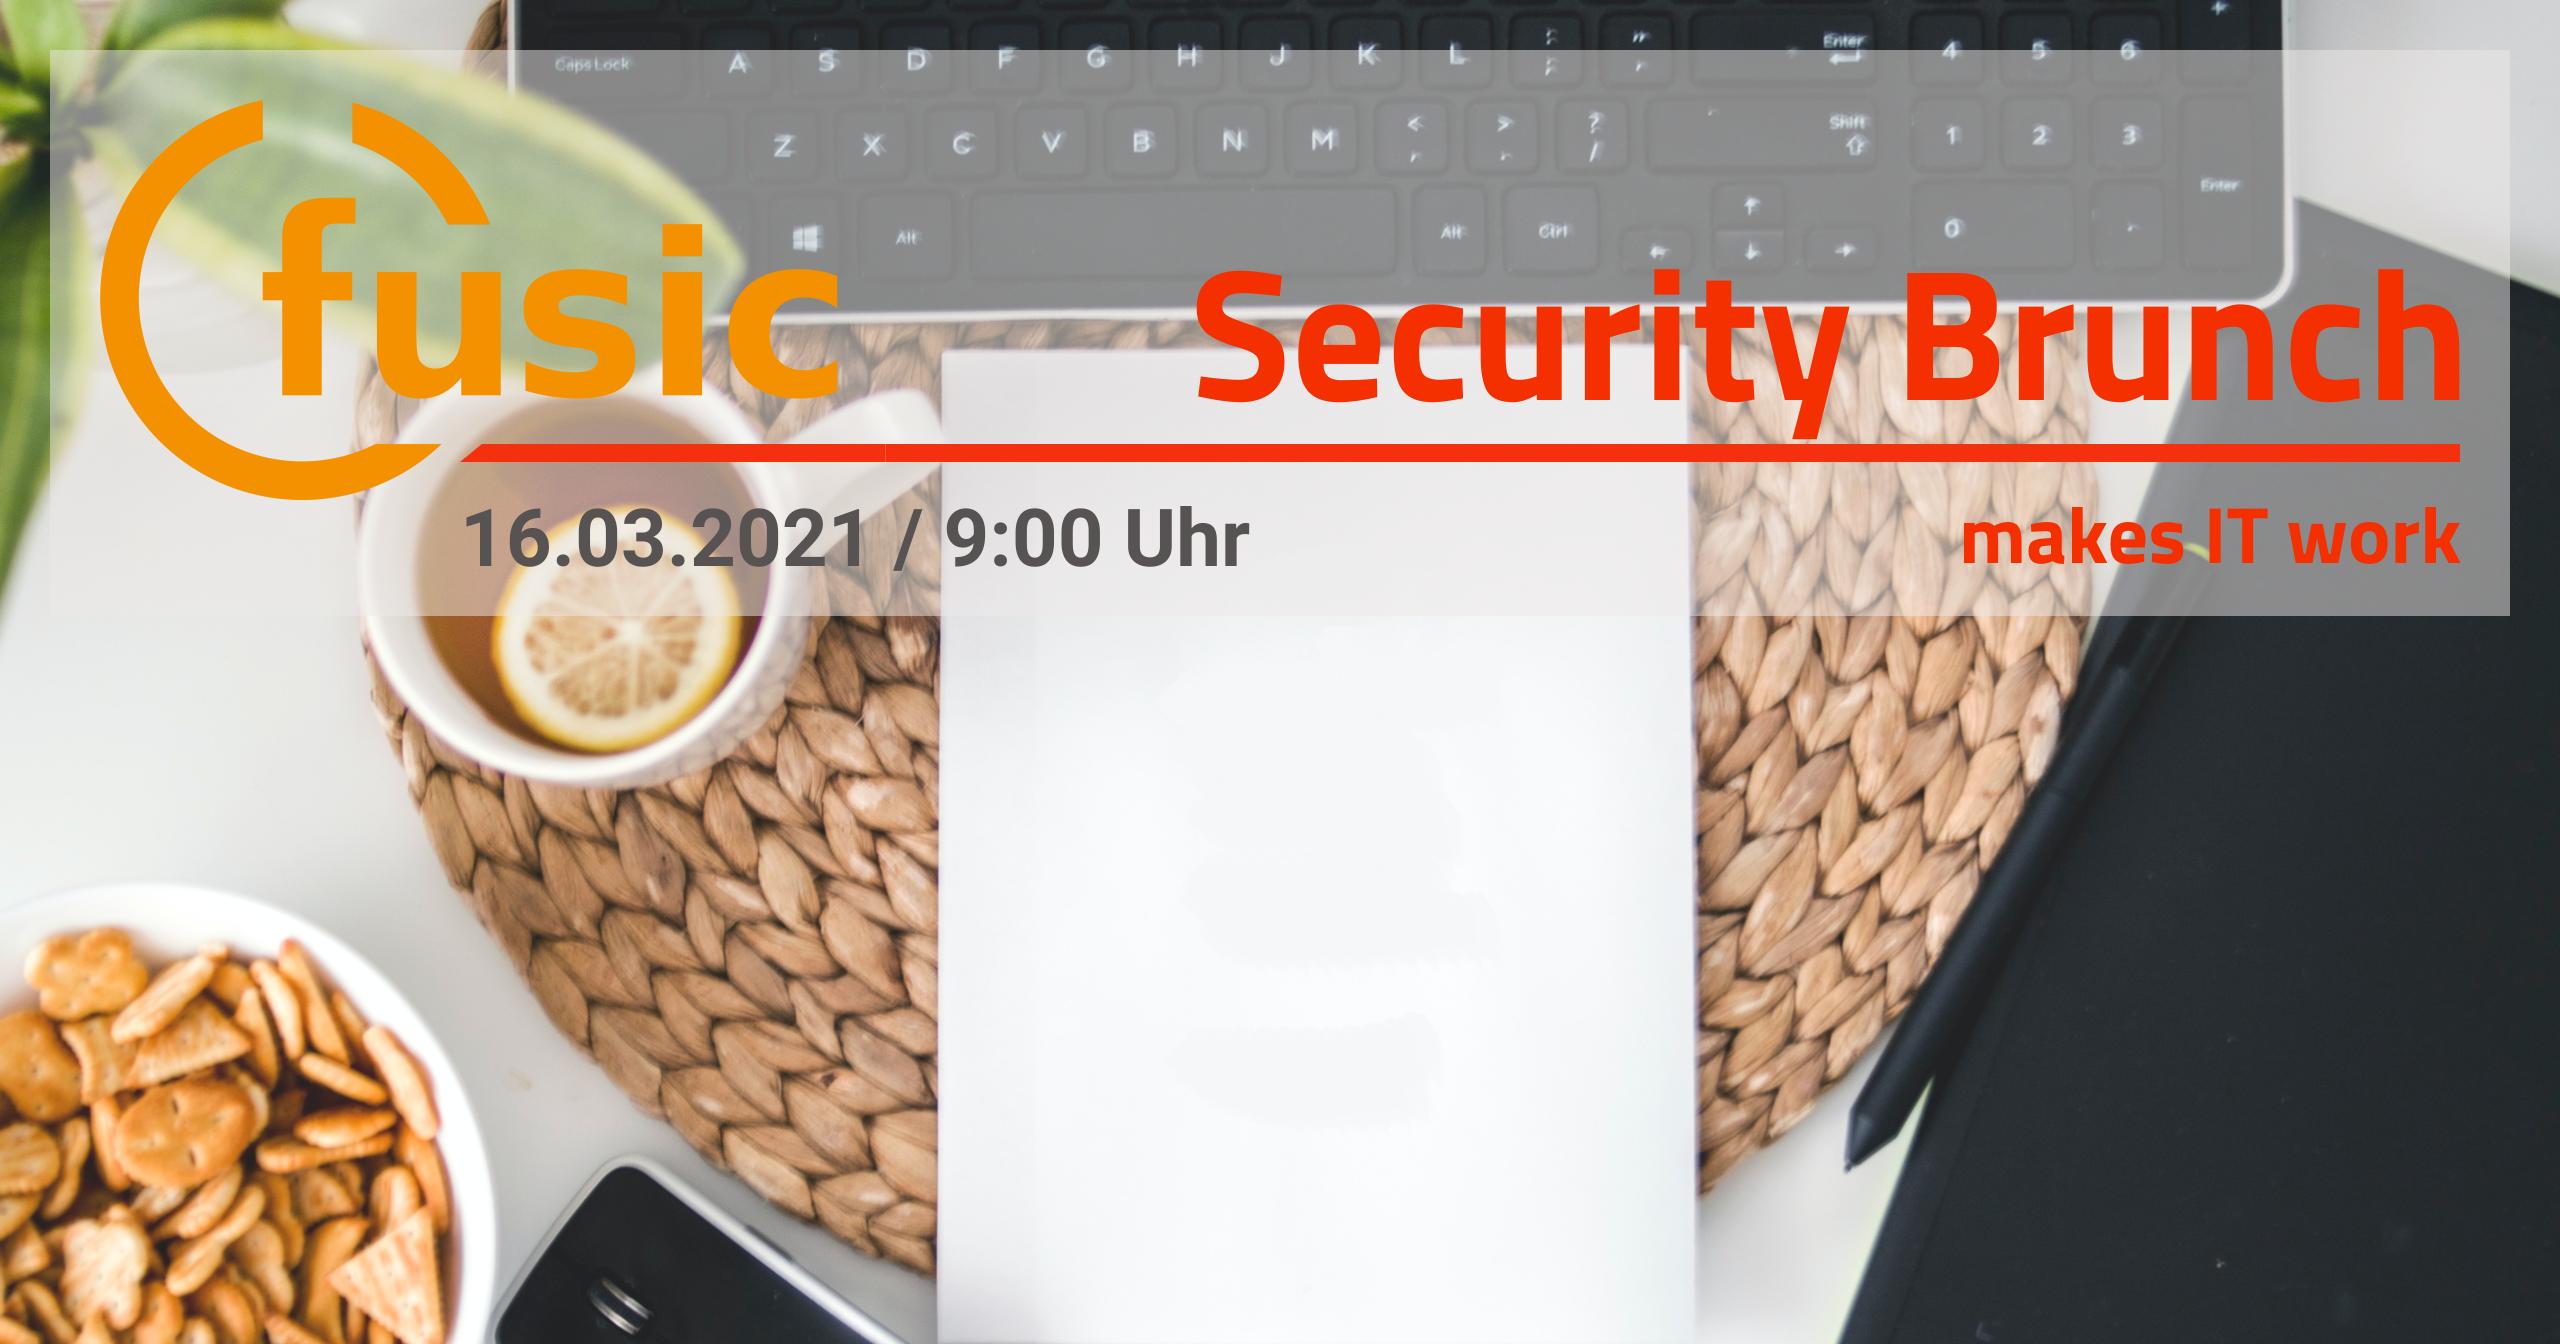 Security Brunch am 16.03.2021 um 9 Uhr